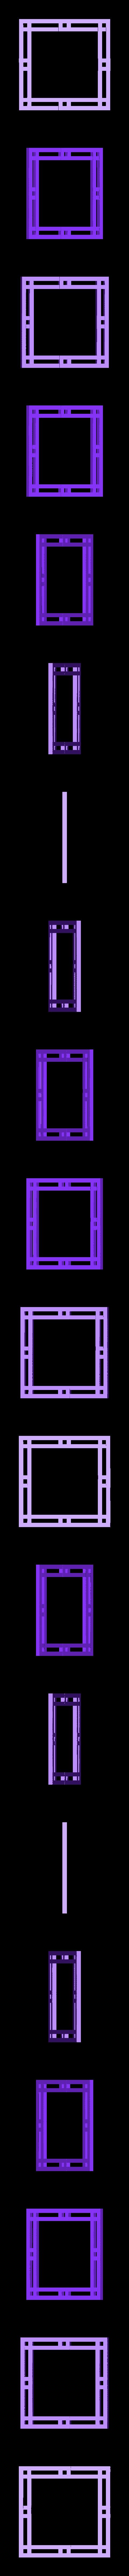 pozyx-anchor-O.stl Download free STL file Pozyx UWB   Tag Casing & Anchor Pedestal • 3D print model, whoopsie